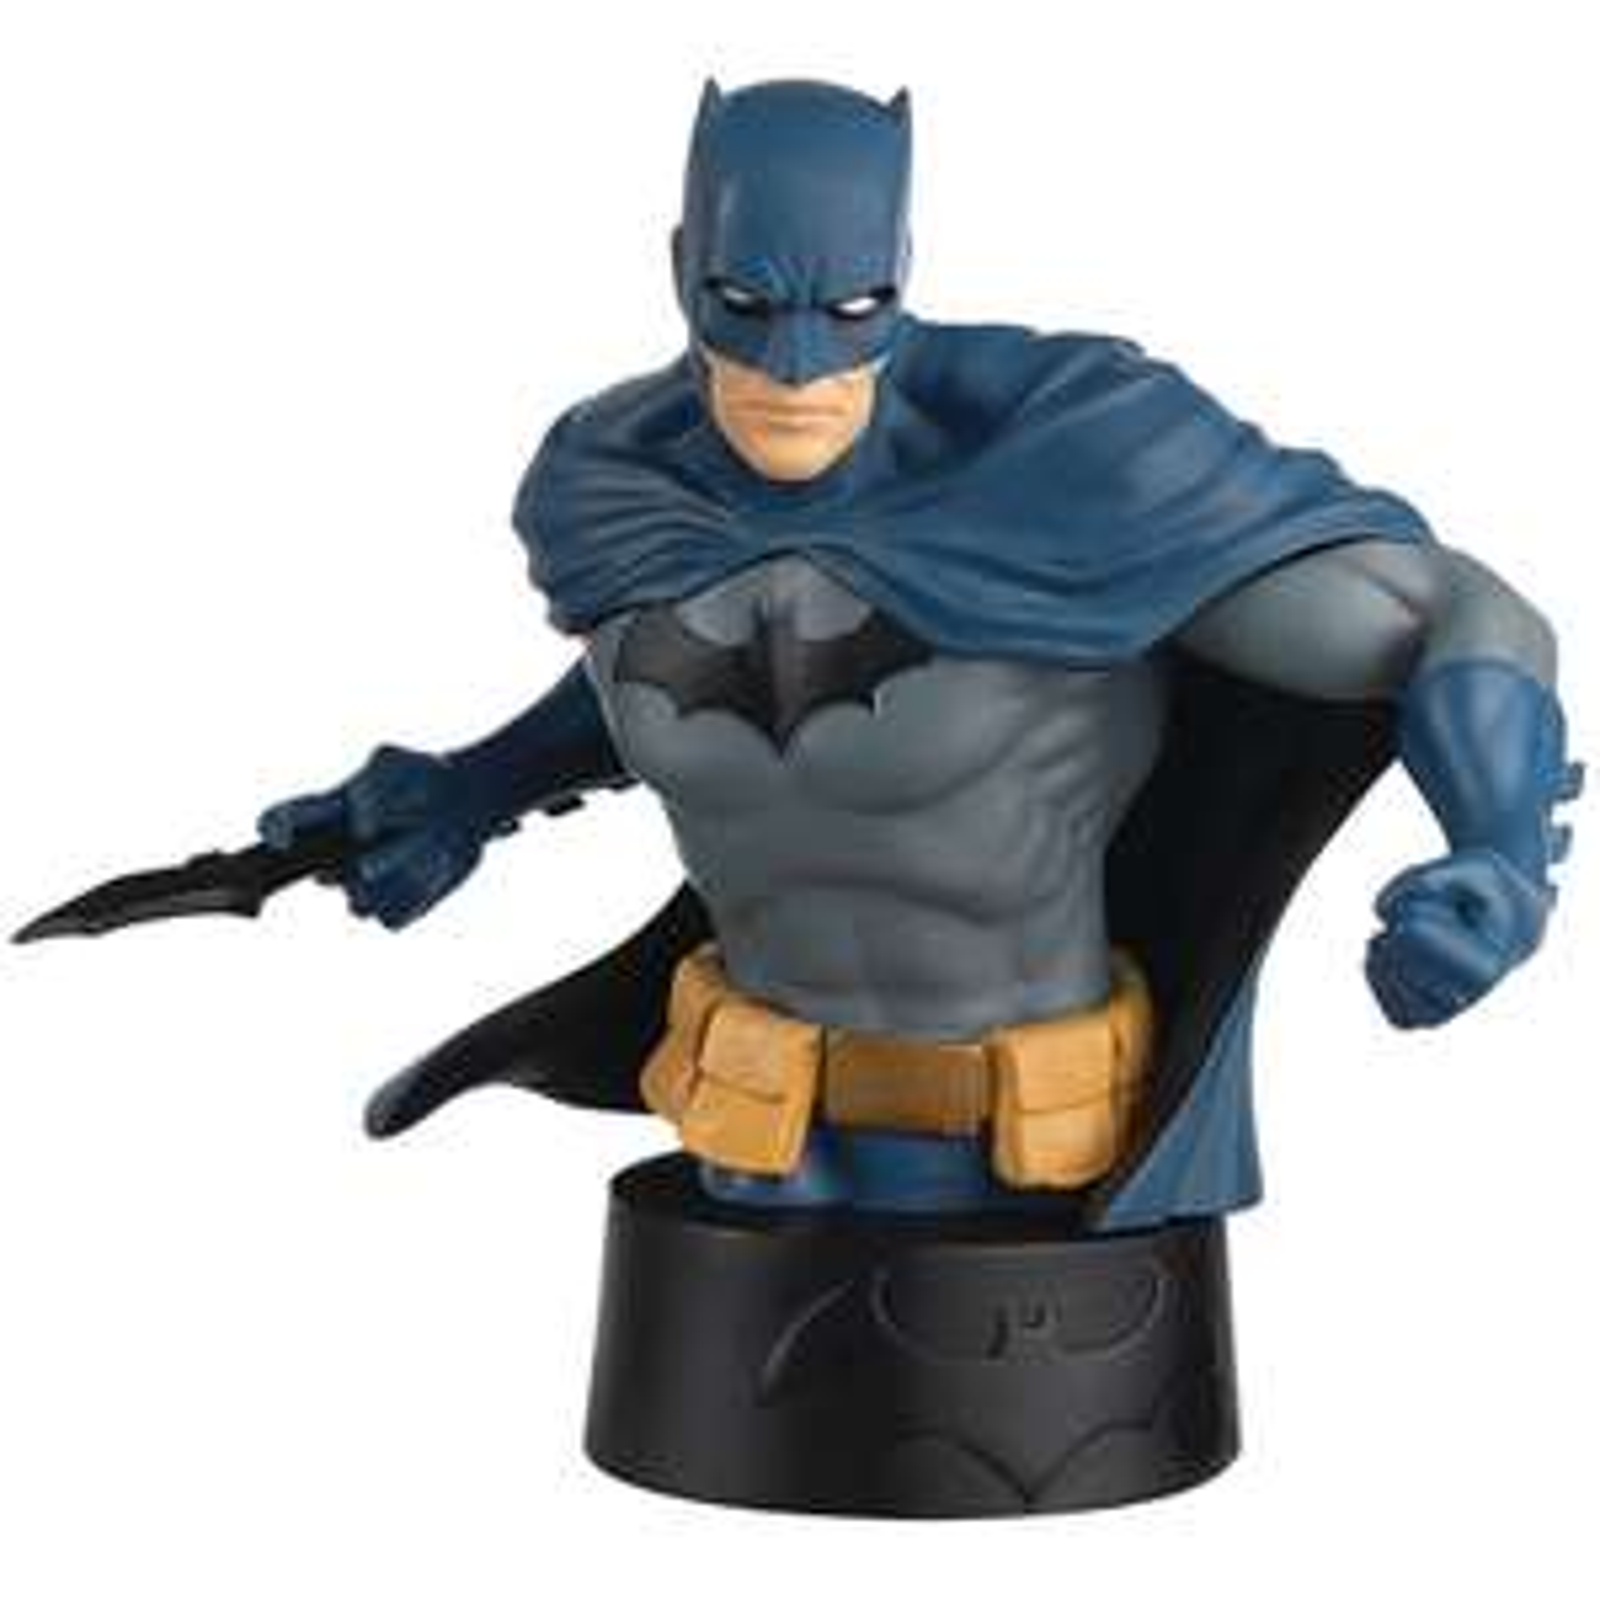 Eaglemoss DC Comics Batman Resin Bust